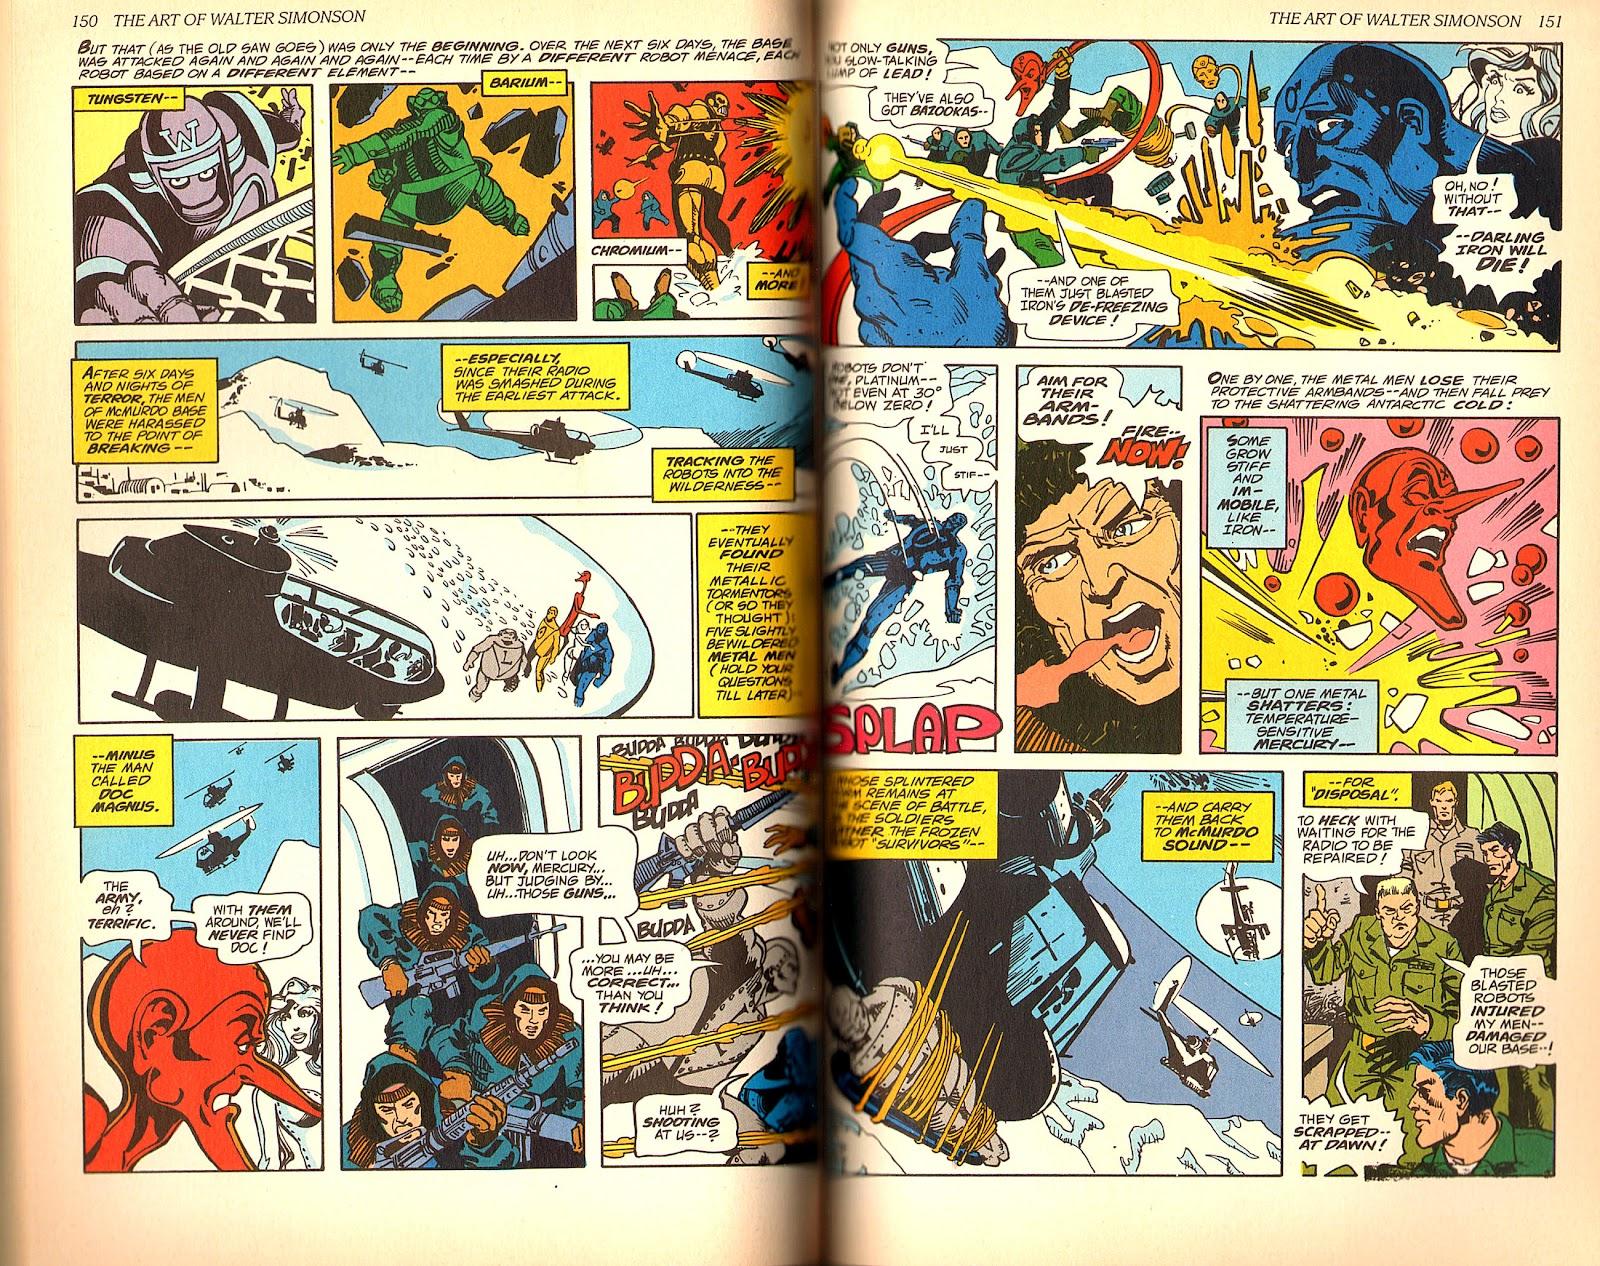 Read online The Art of Walter Simonson comic -  Issue # TPB - 77